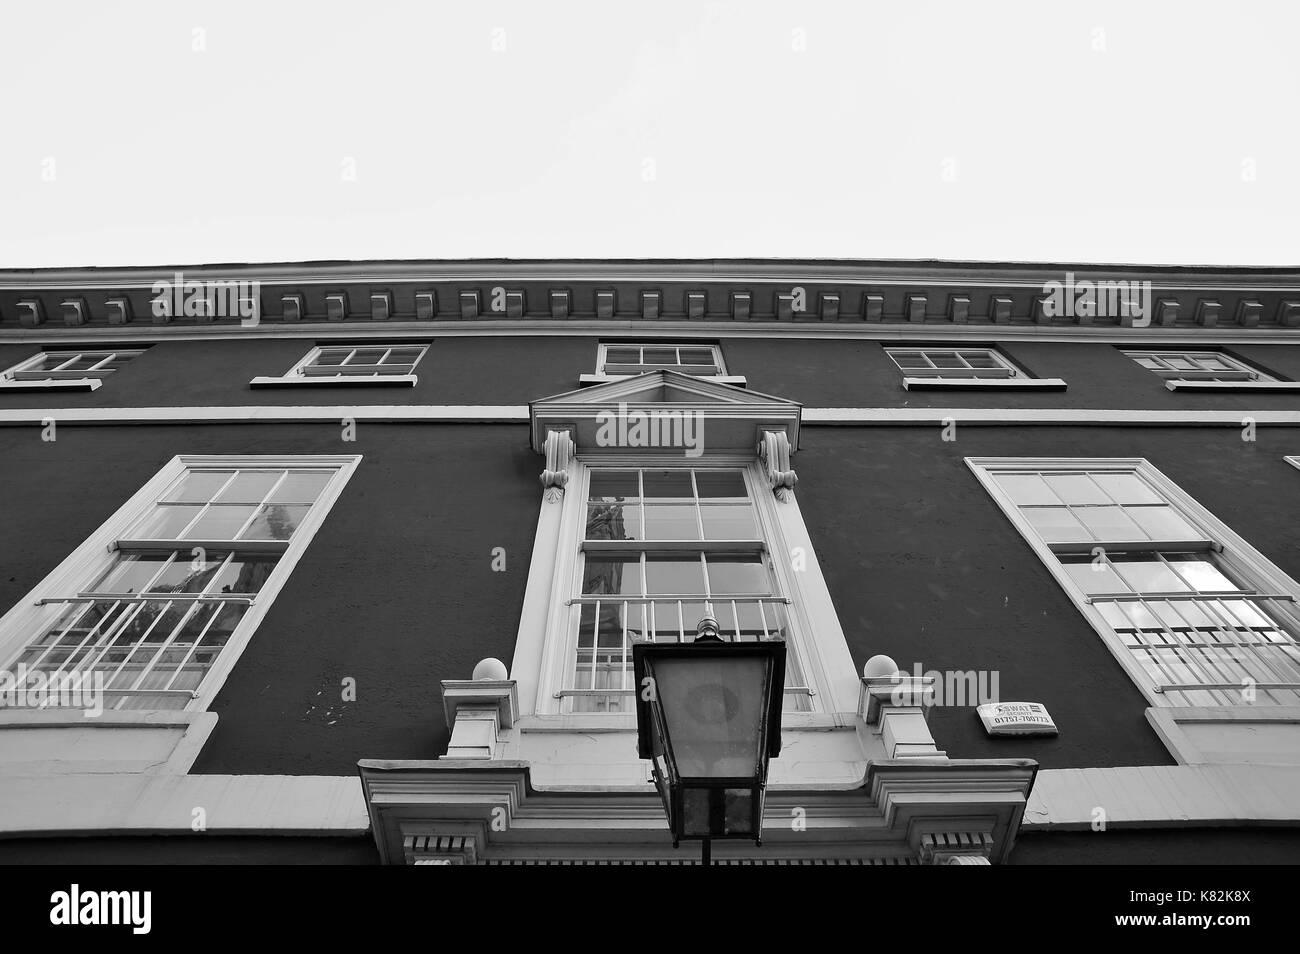 York City centre in photo's - Stock Image